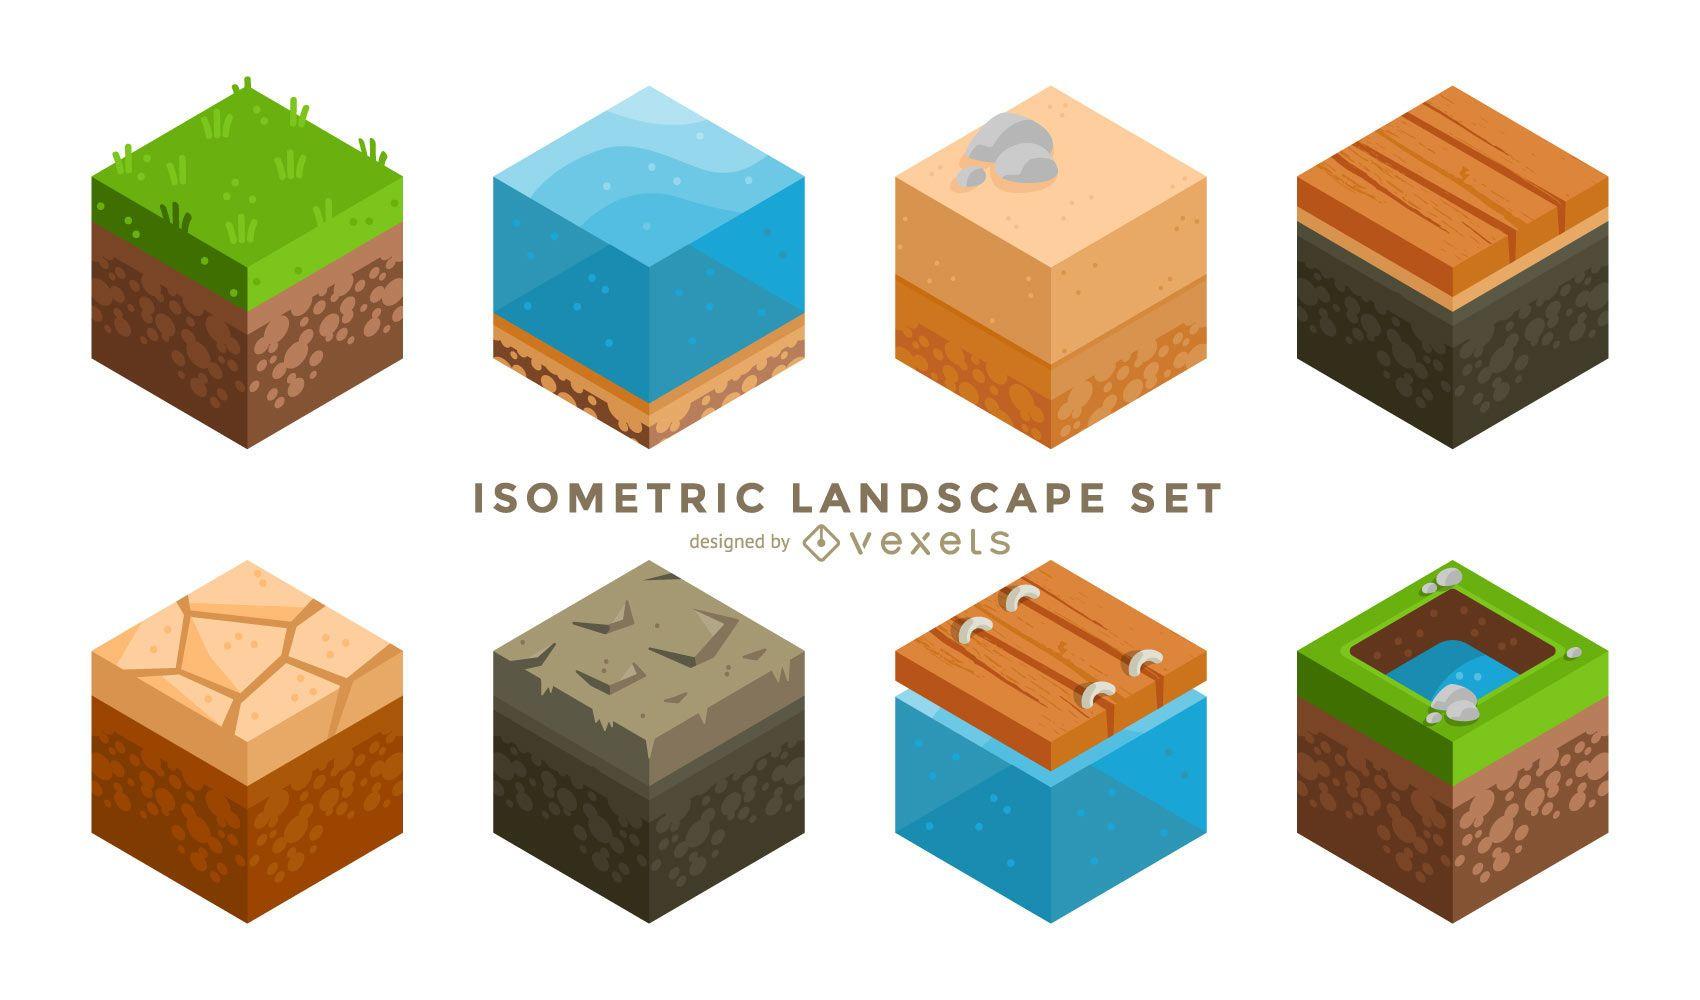 Cubo de paisaje isométrico estilo minecraft